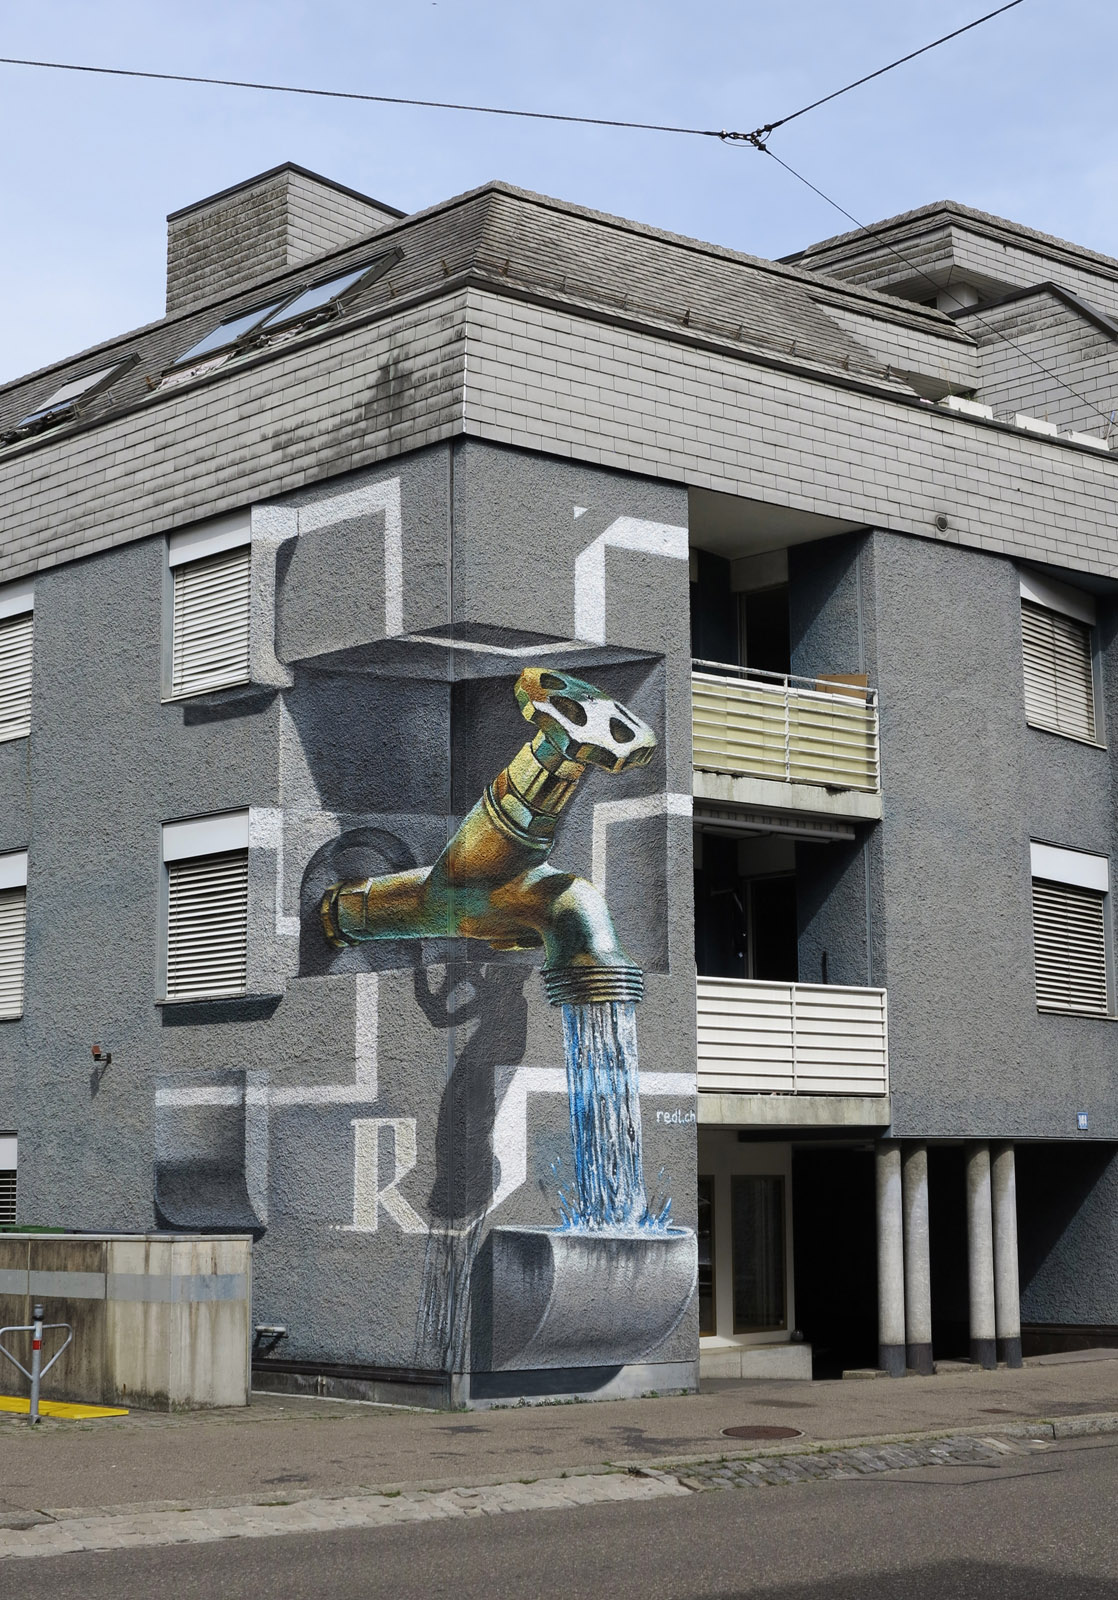 Mural Free Water: Baslerstrasse 144, Zürich. 4.5 m x 7.5 m.  Acrylic and Spraycan